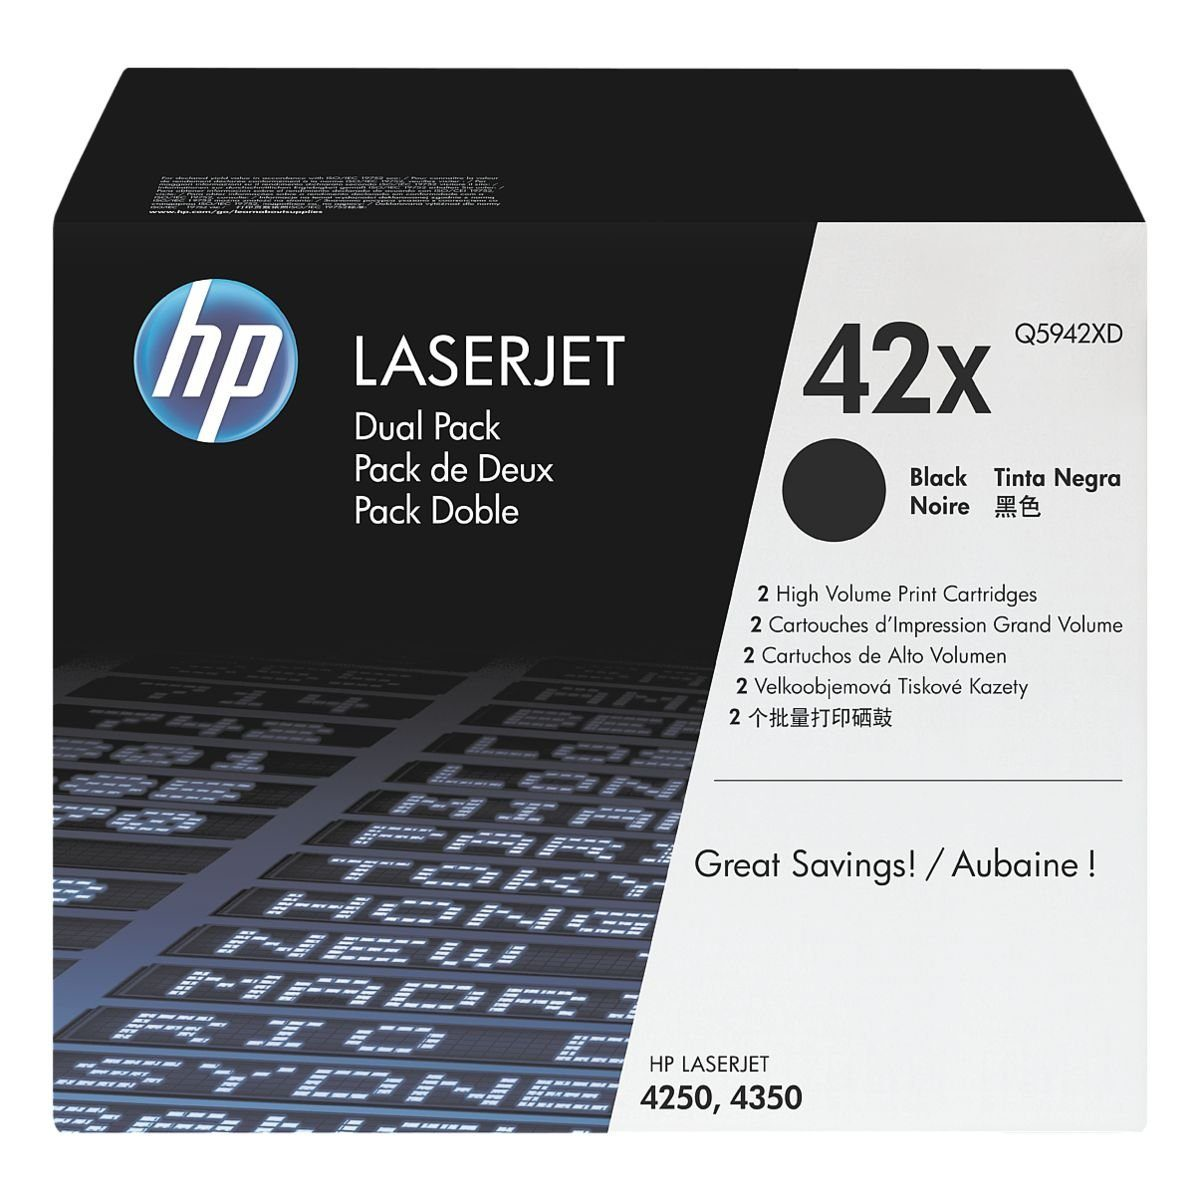 HP Doppelpack Druckkassette »HP Q5942XD« HP 42A